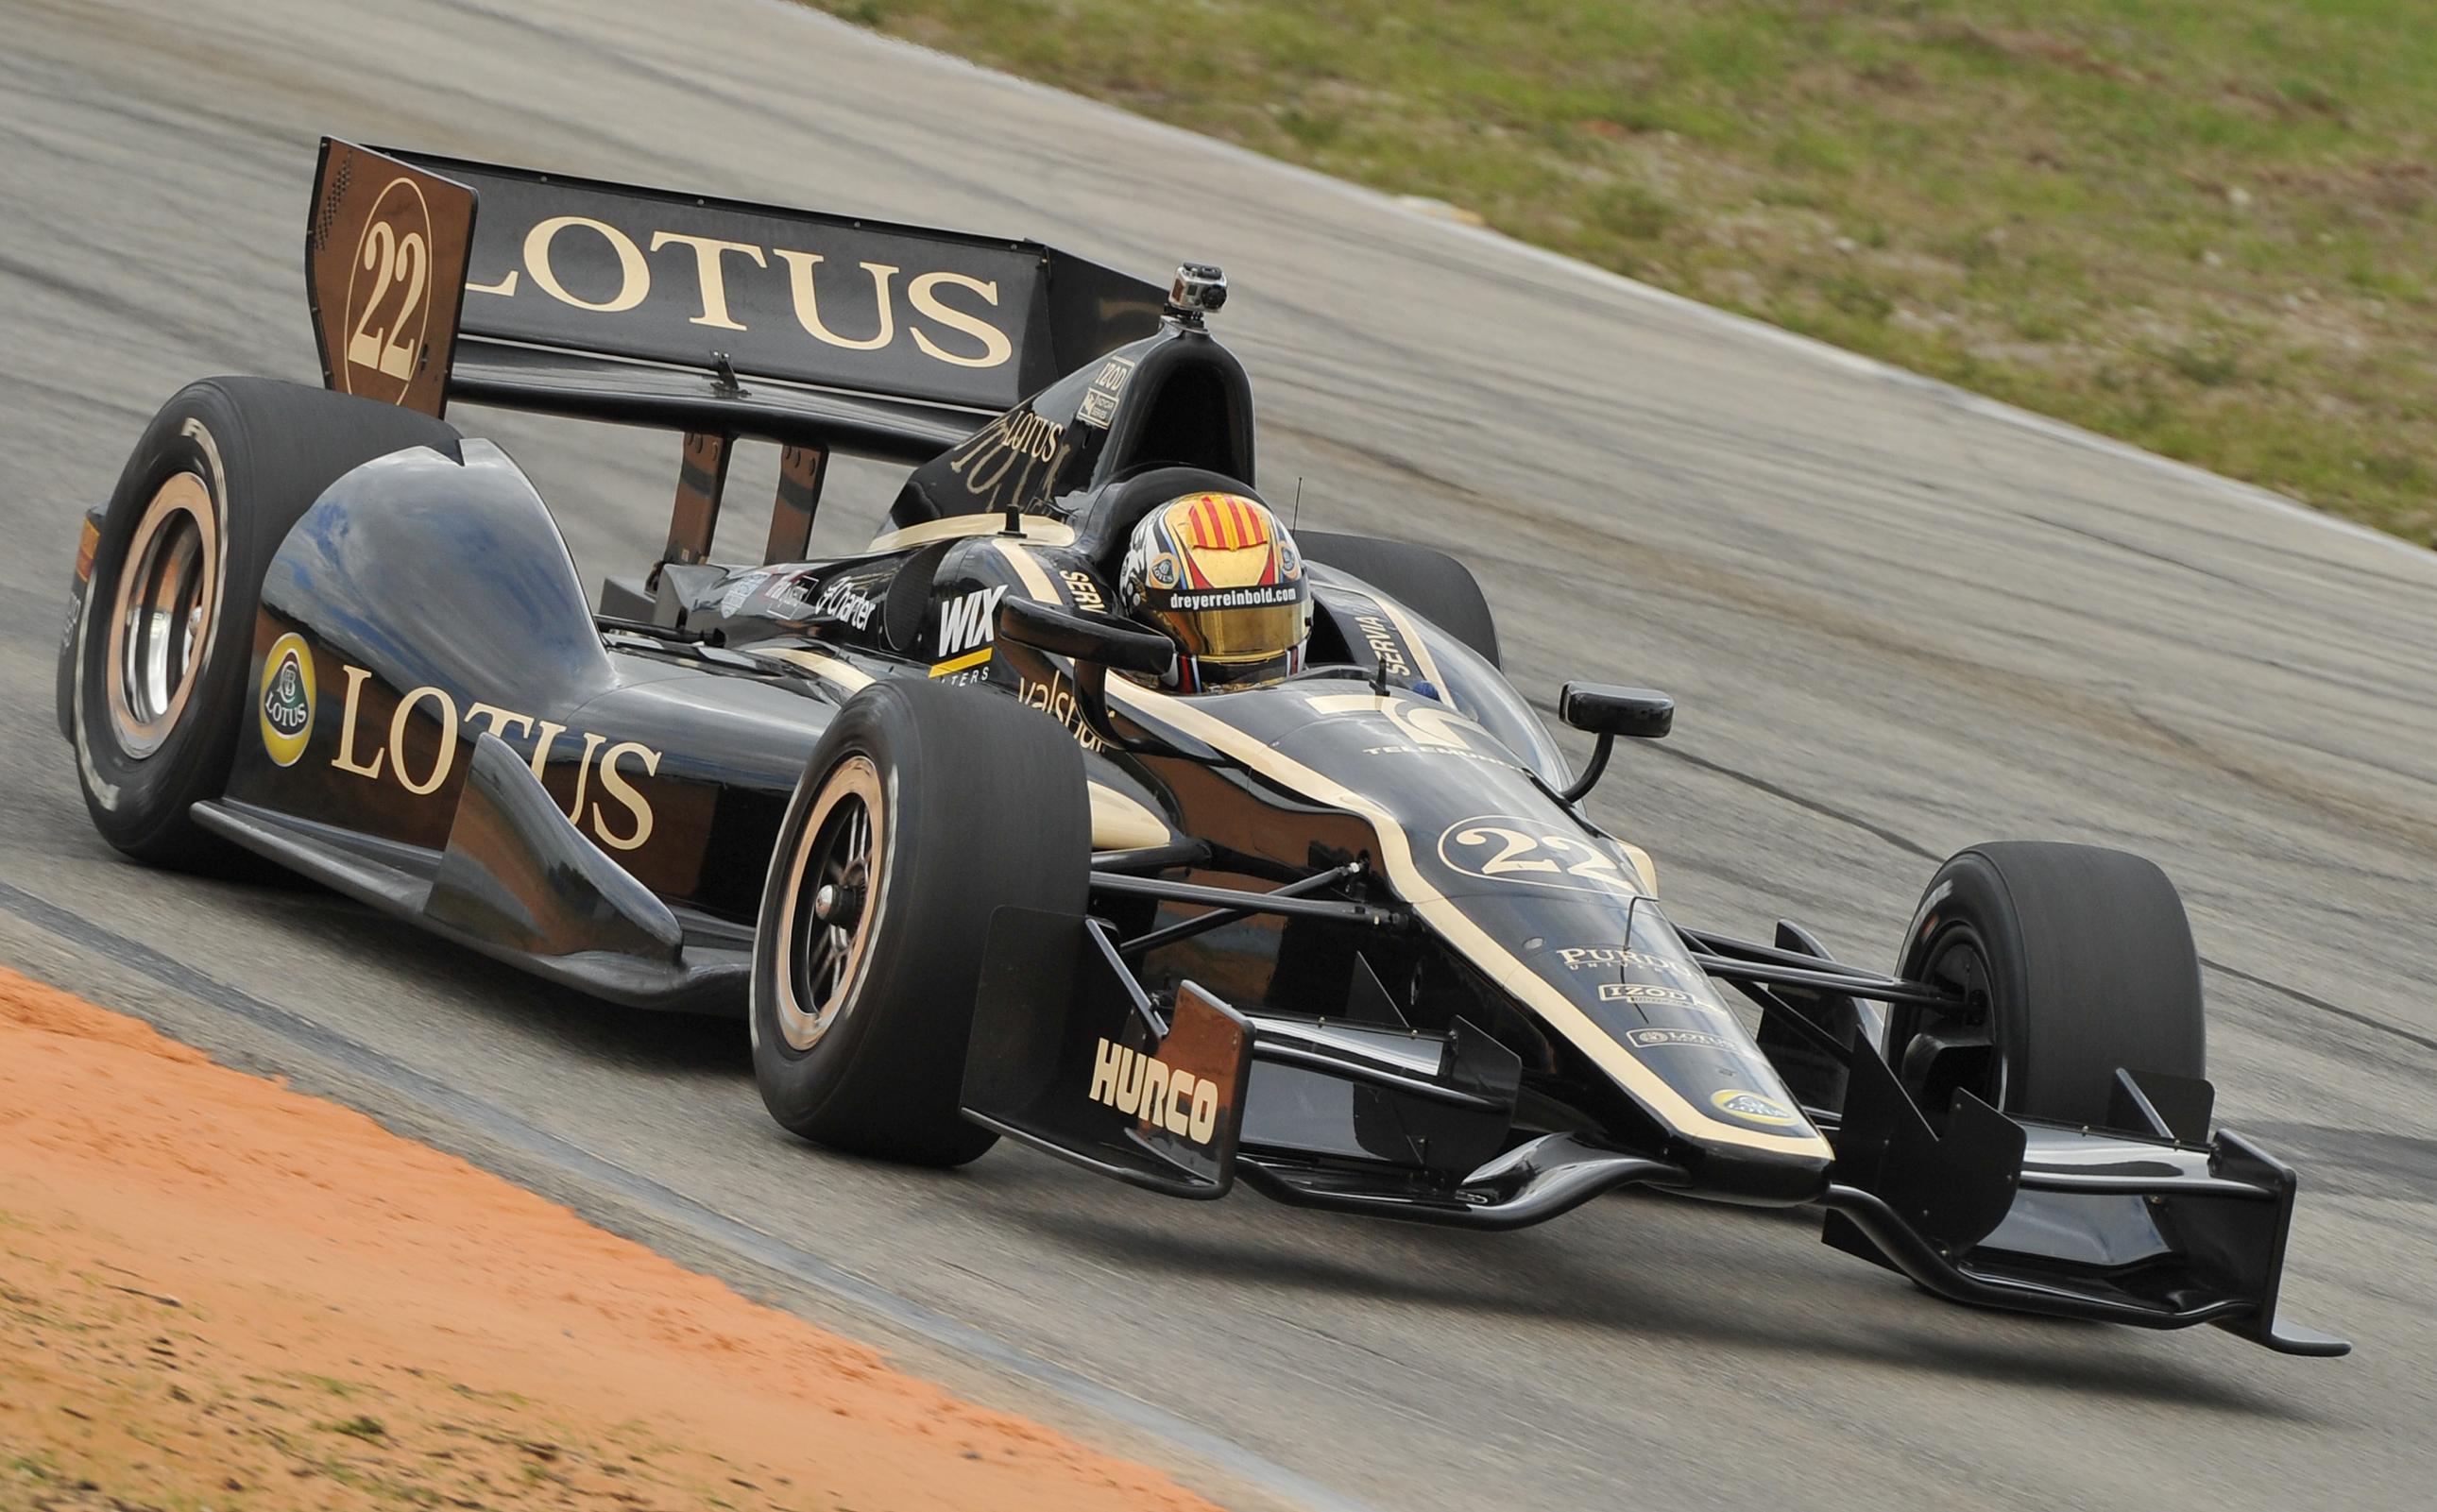 Purdue partners with 3 IndyCar teams for 2012 season